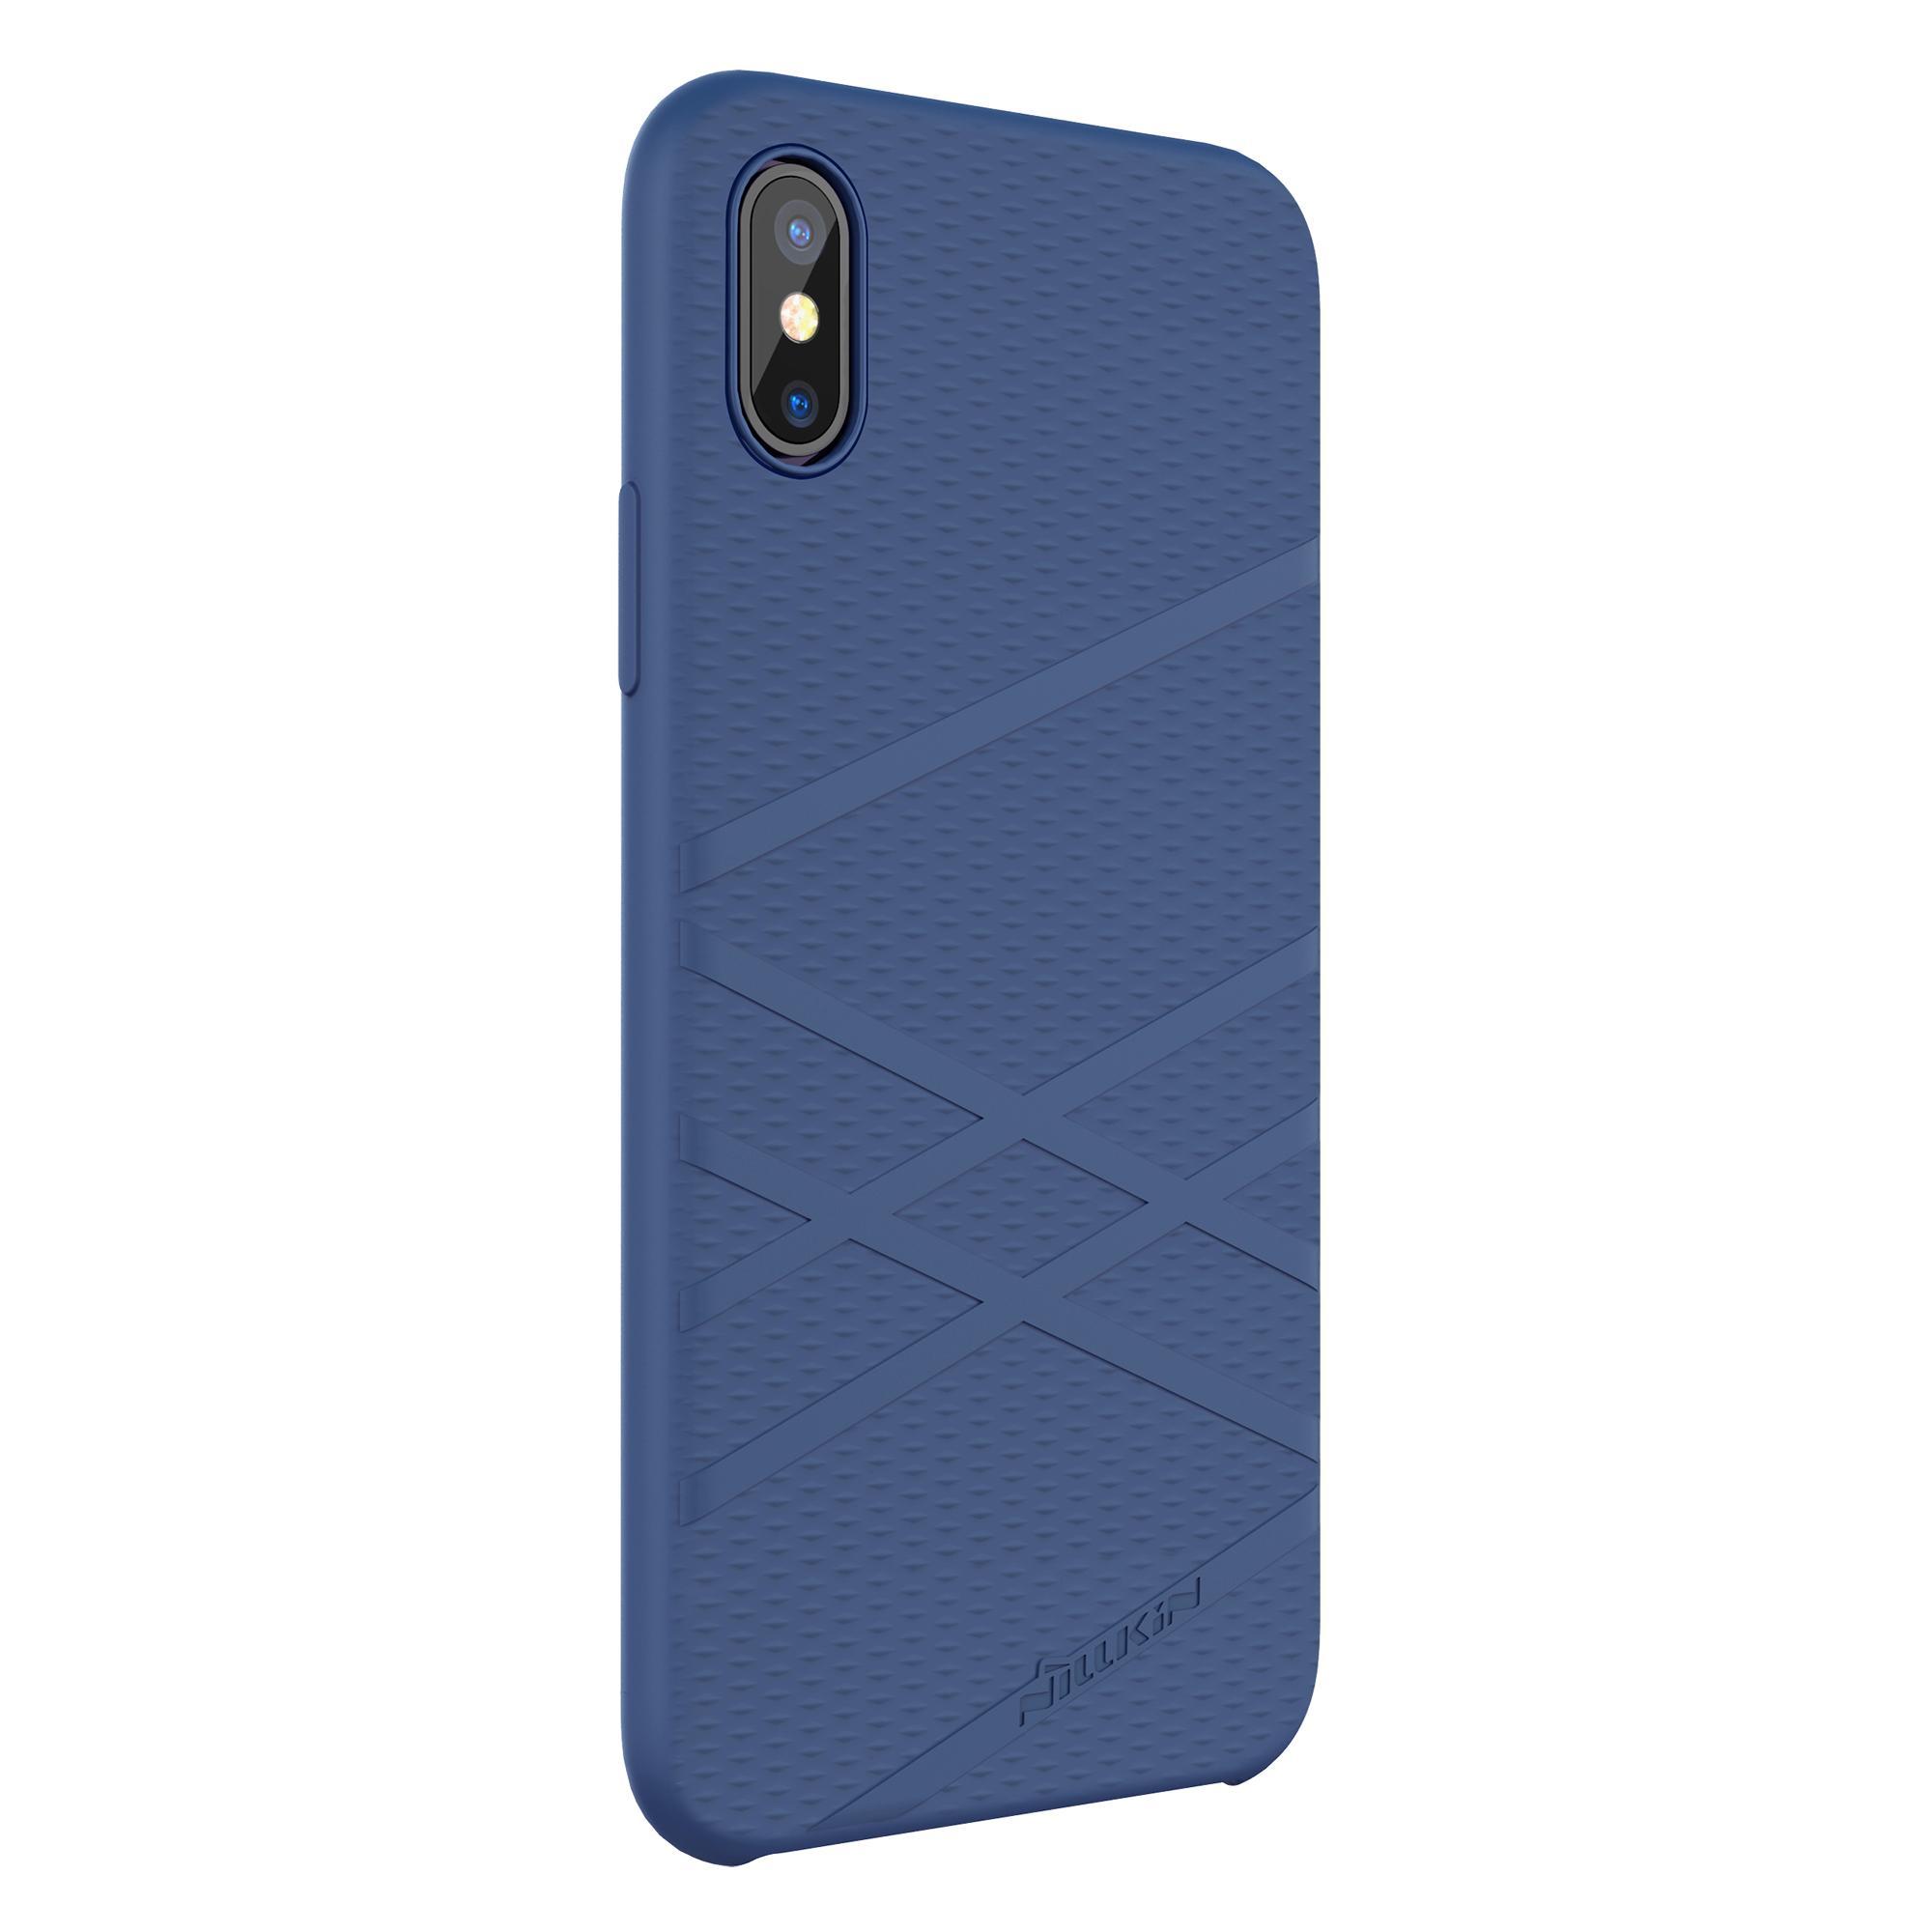 Retail Apple OEM Genuine Original Soft Silicone Case Cover For Apple iPhone X